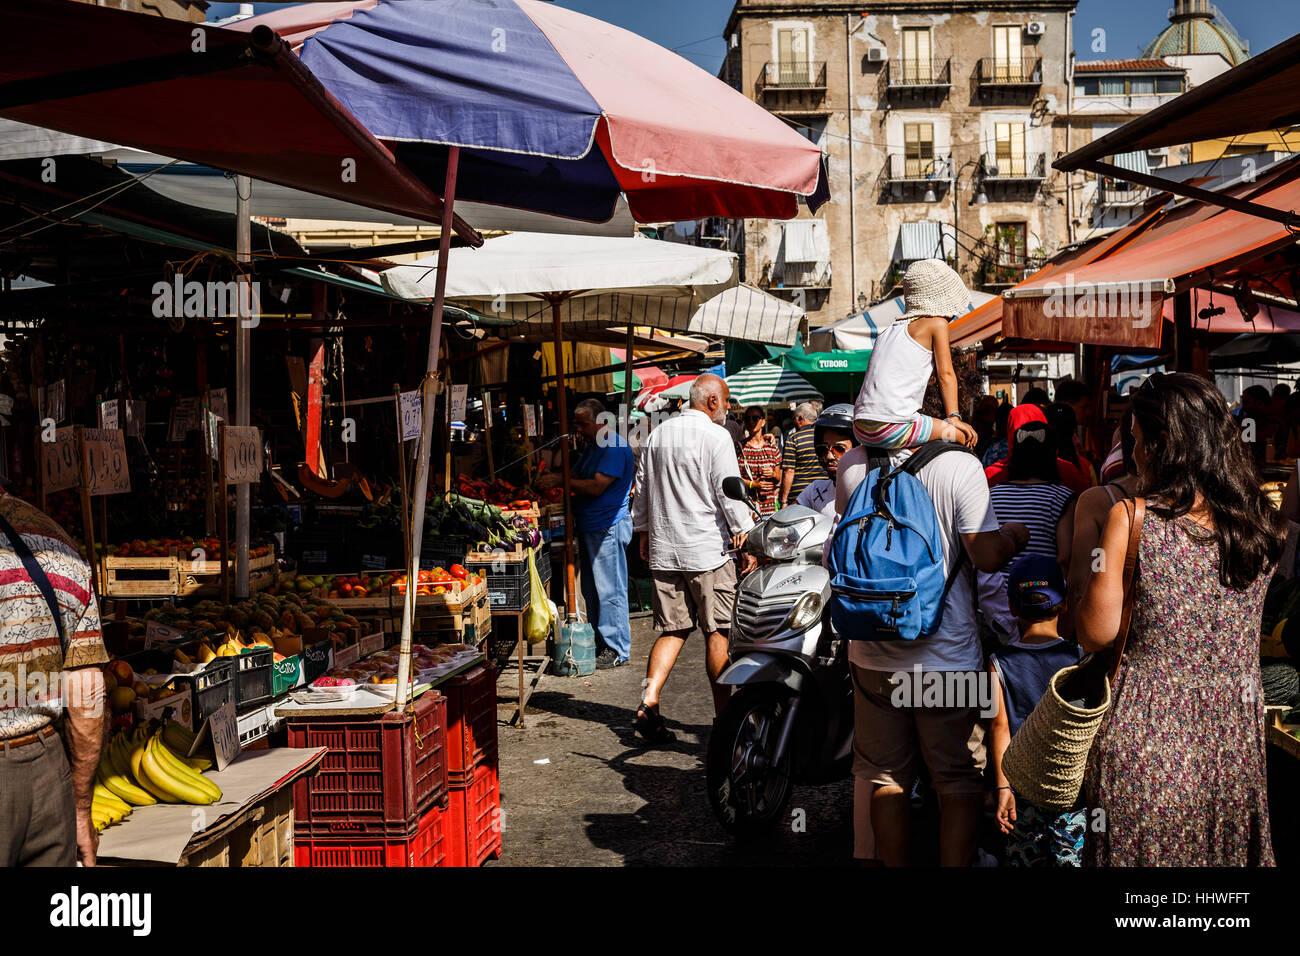 Ballarò market, Palermo, Sicily, Italy - Stock Image